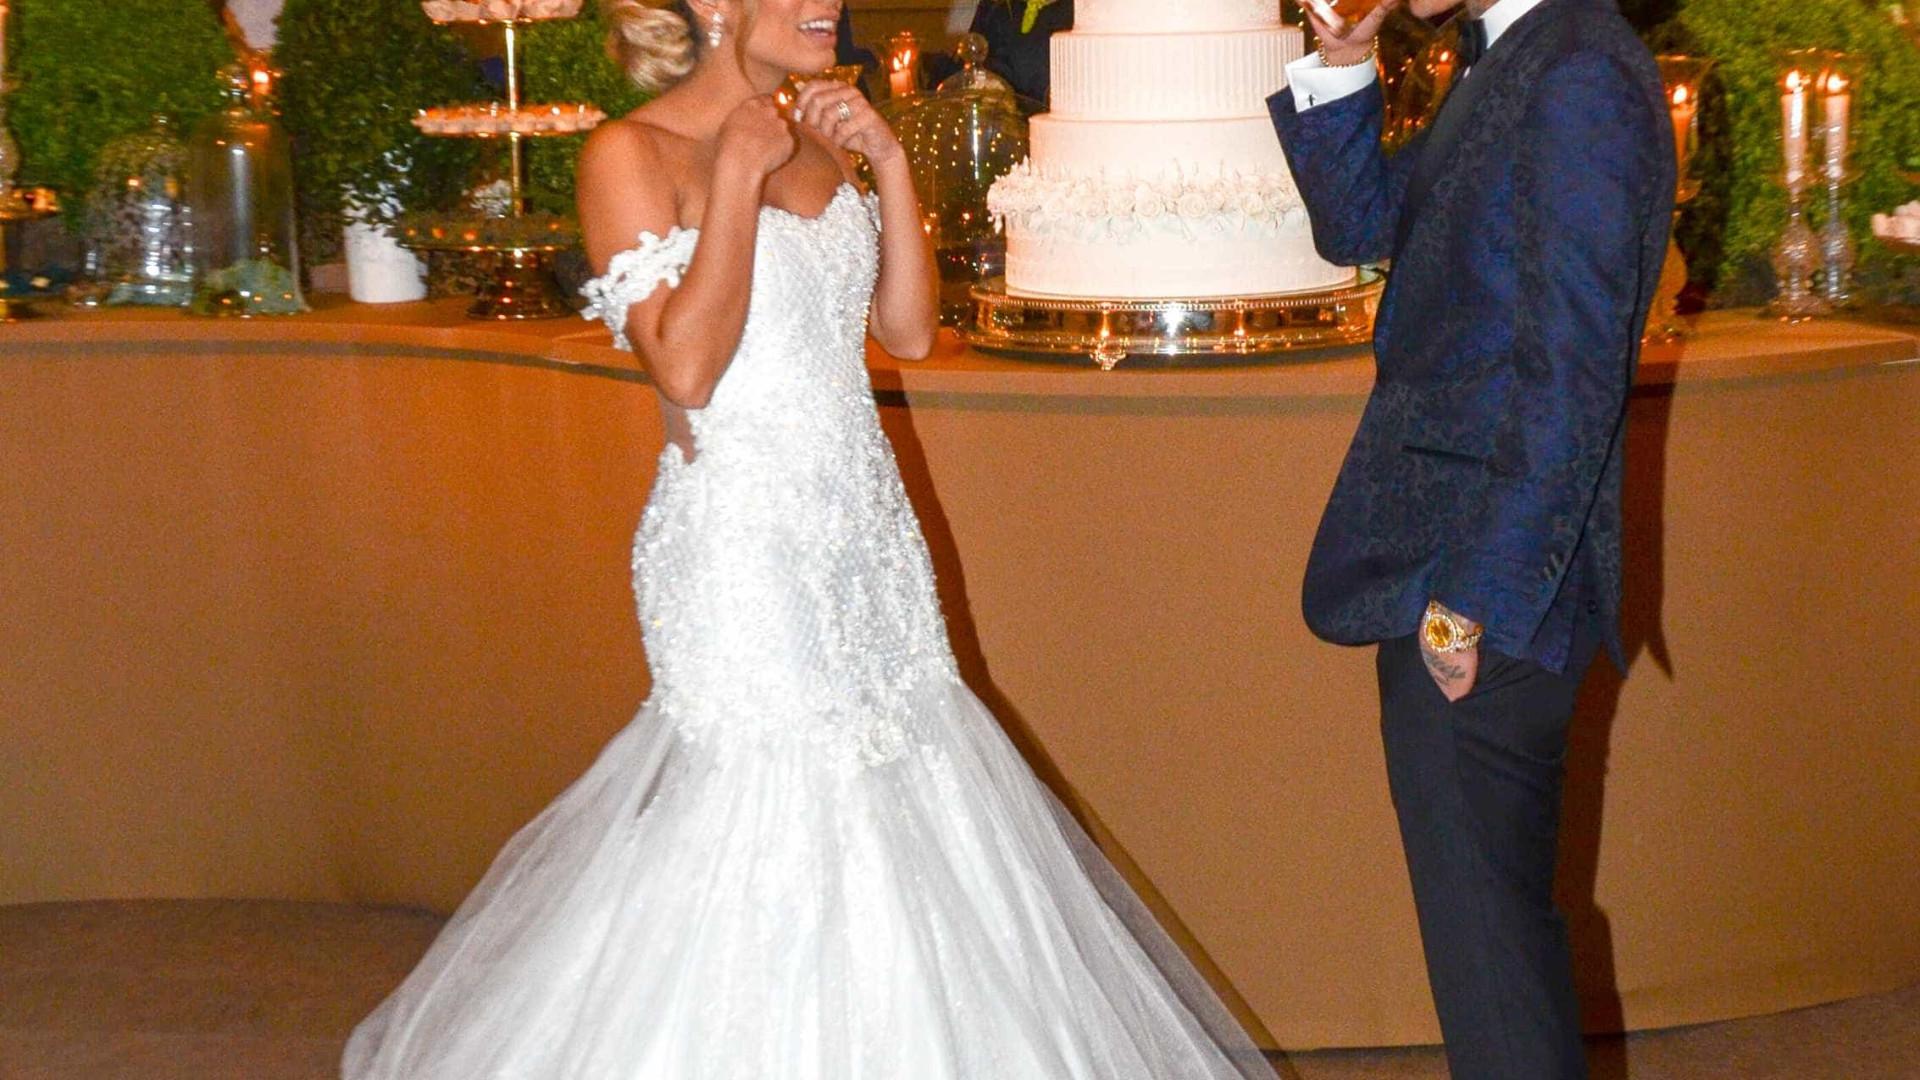 Lexa mostra momentos de surpresa e nervosismo no casamento; veja vídeos